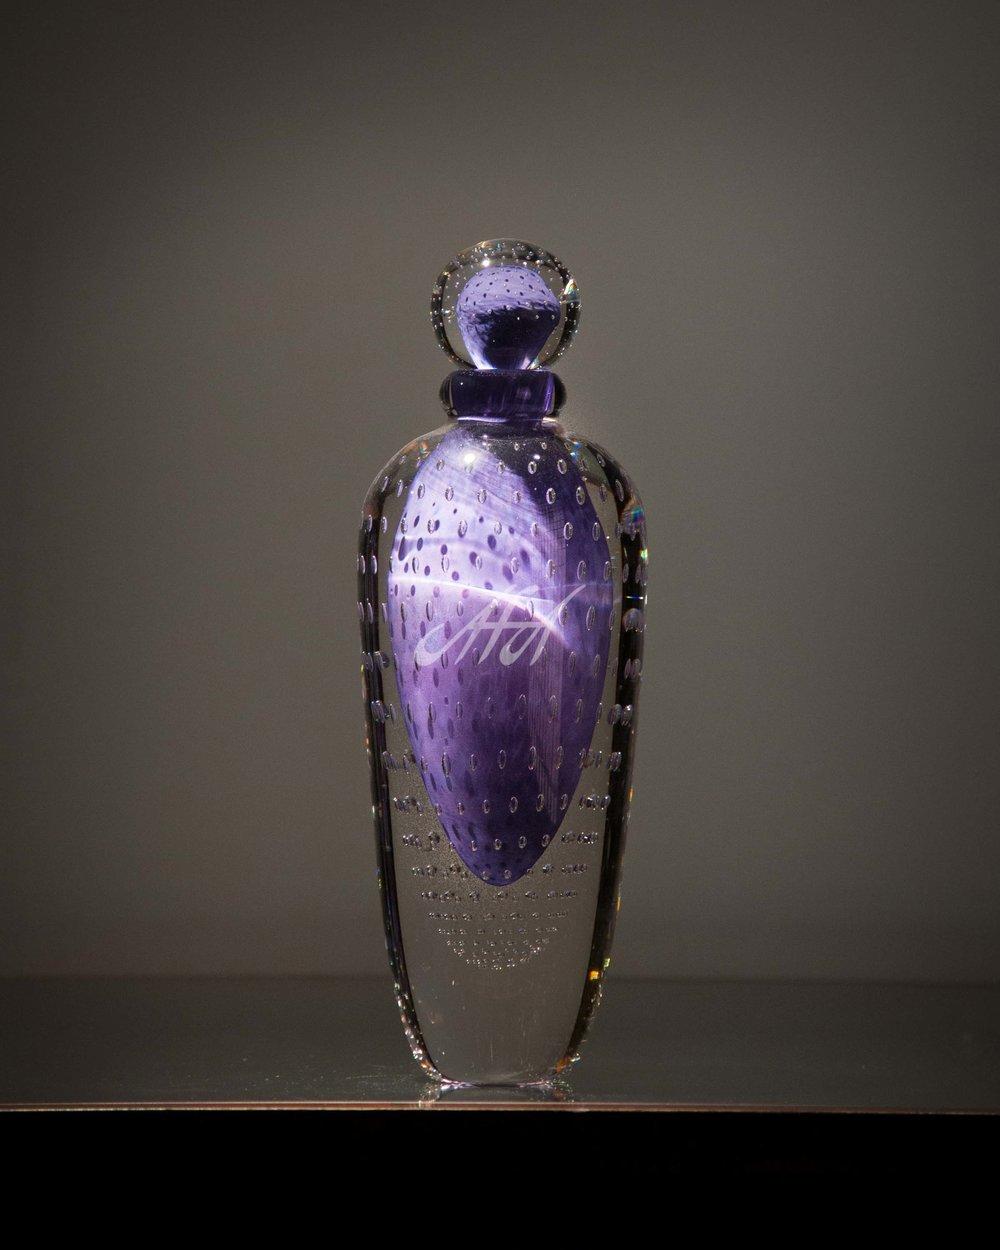 AFA_RB_Lavender_bottle2 watermark lores.jpg